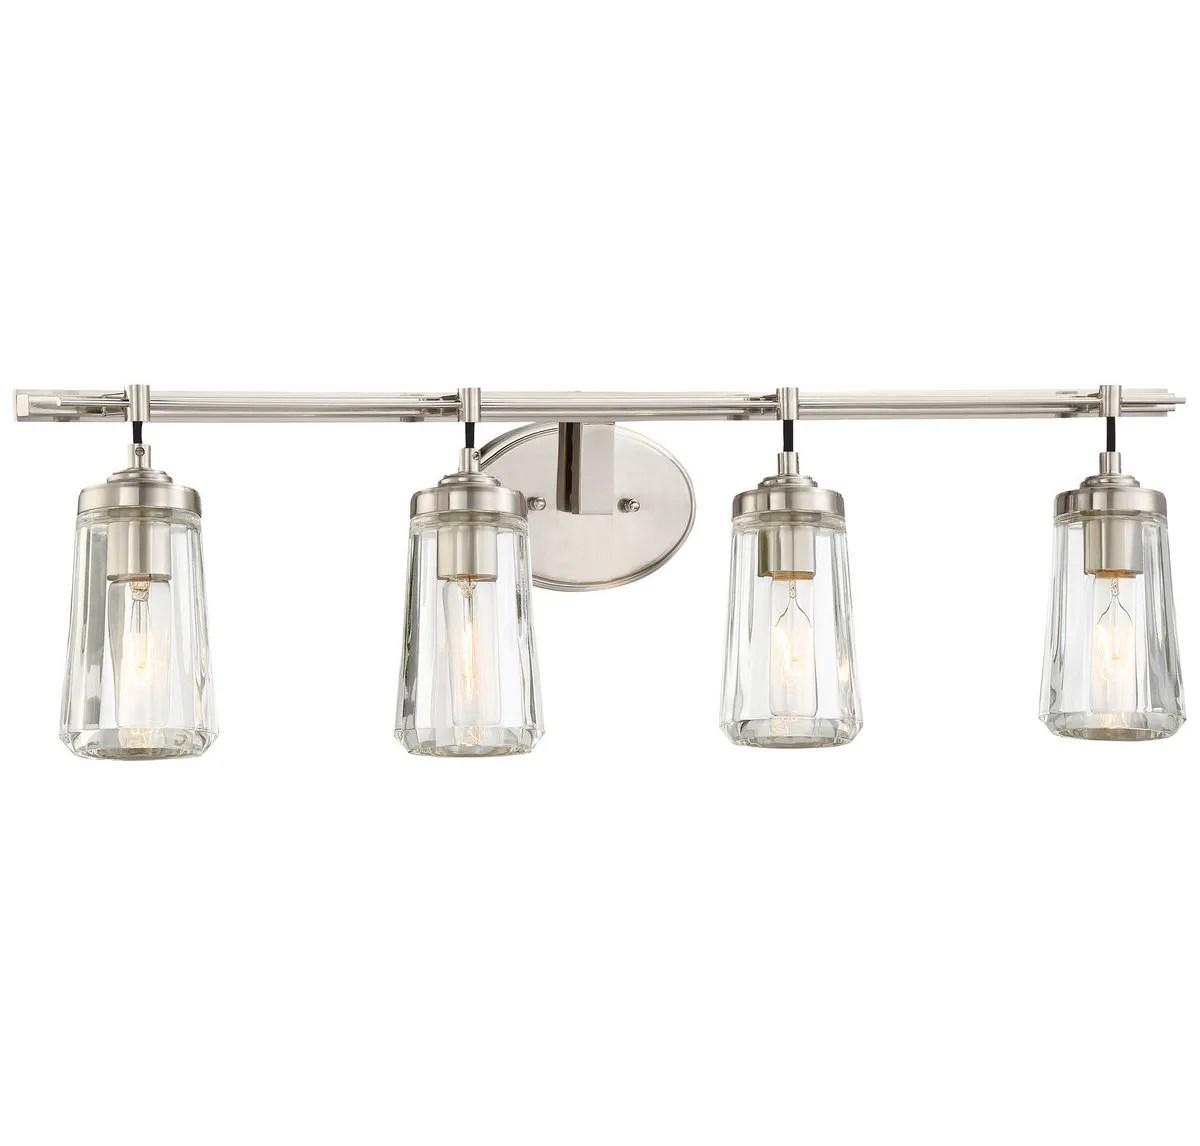 Minka Lavery Poleis 4 Light Bathroom Vanity Light In Brushed Nickel